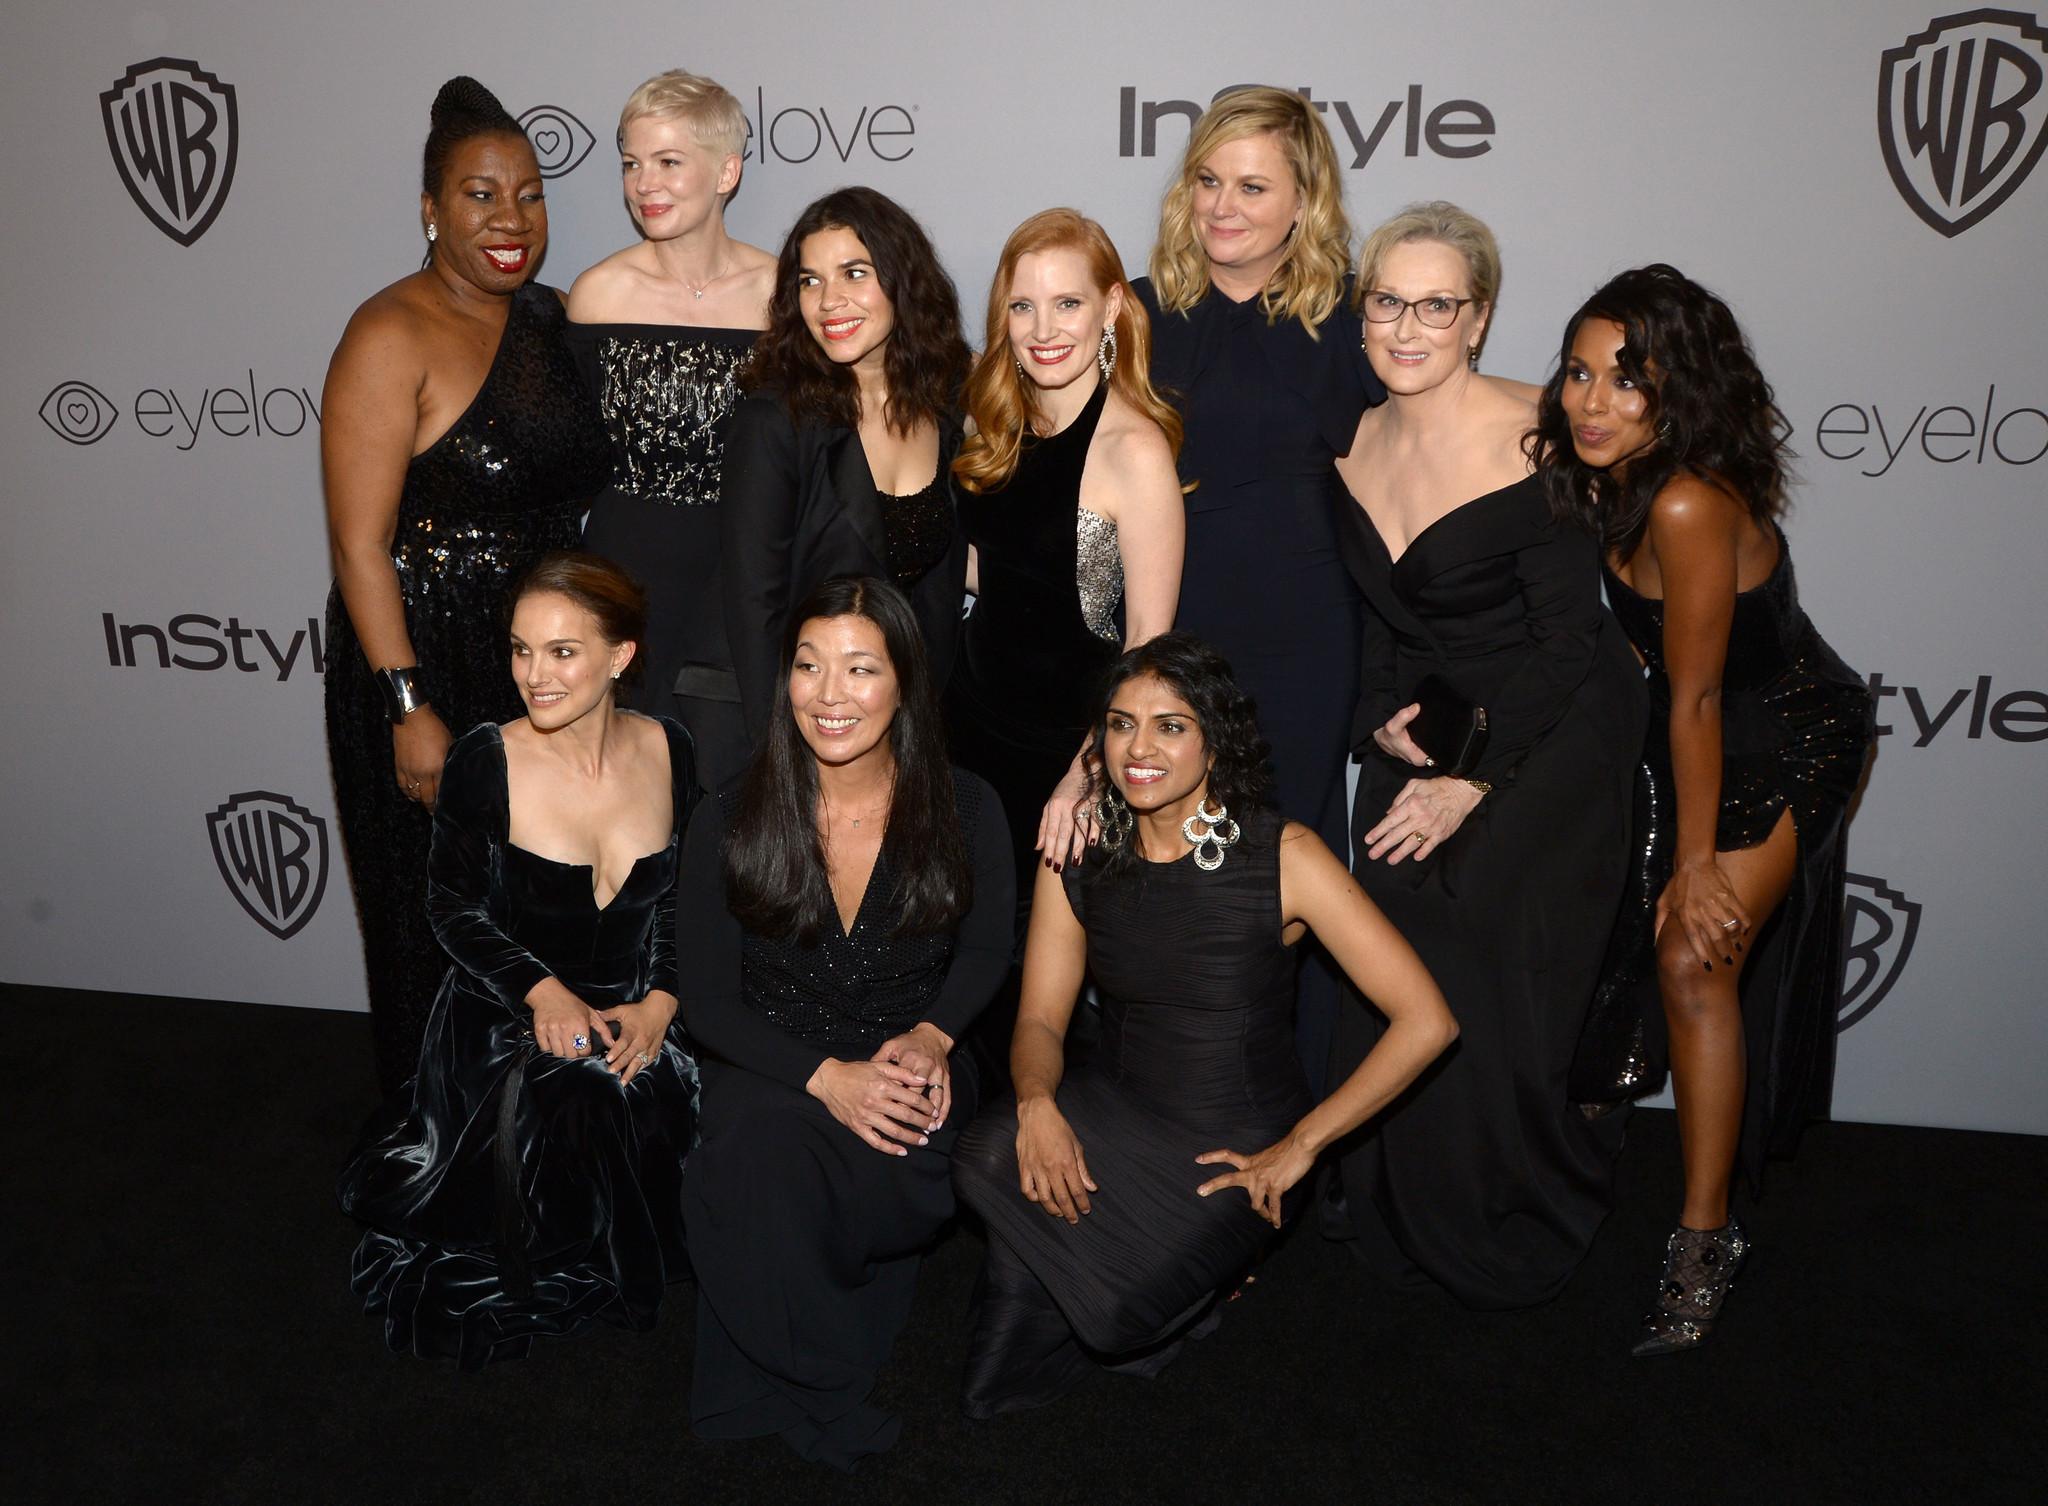 Rosa Clemente, Michelle Williams, America Ferrera, Jessica Chastain, Amy Poehler, Meryl Streep and Kerry Washington